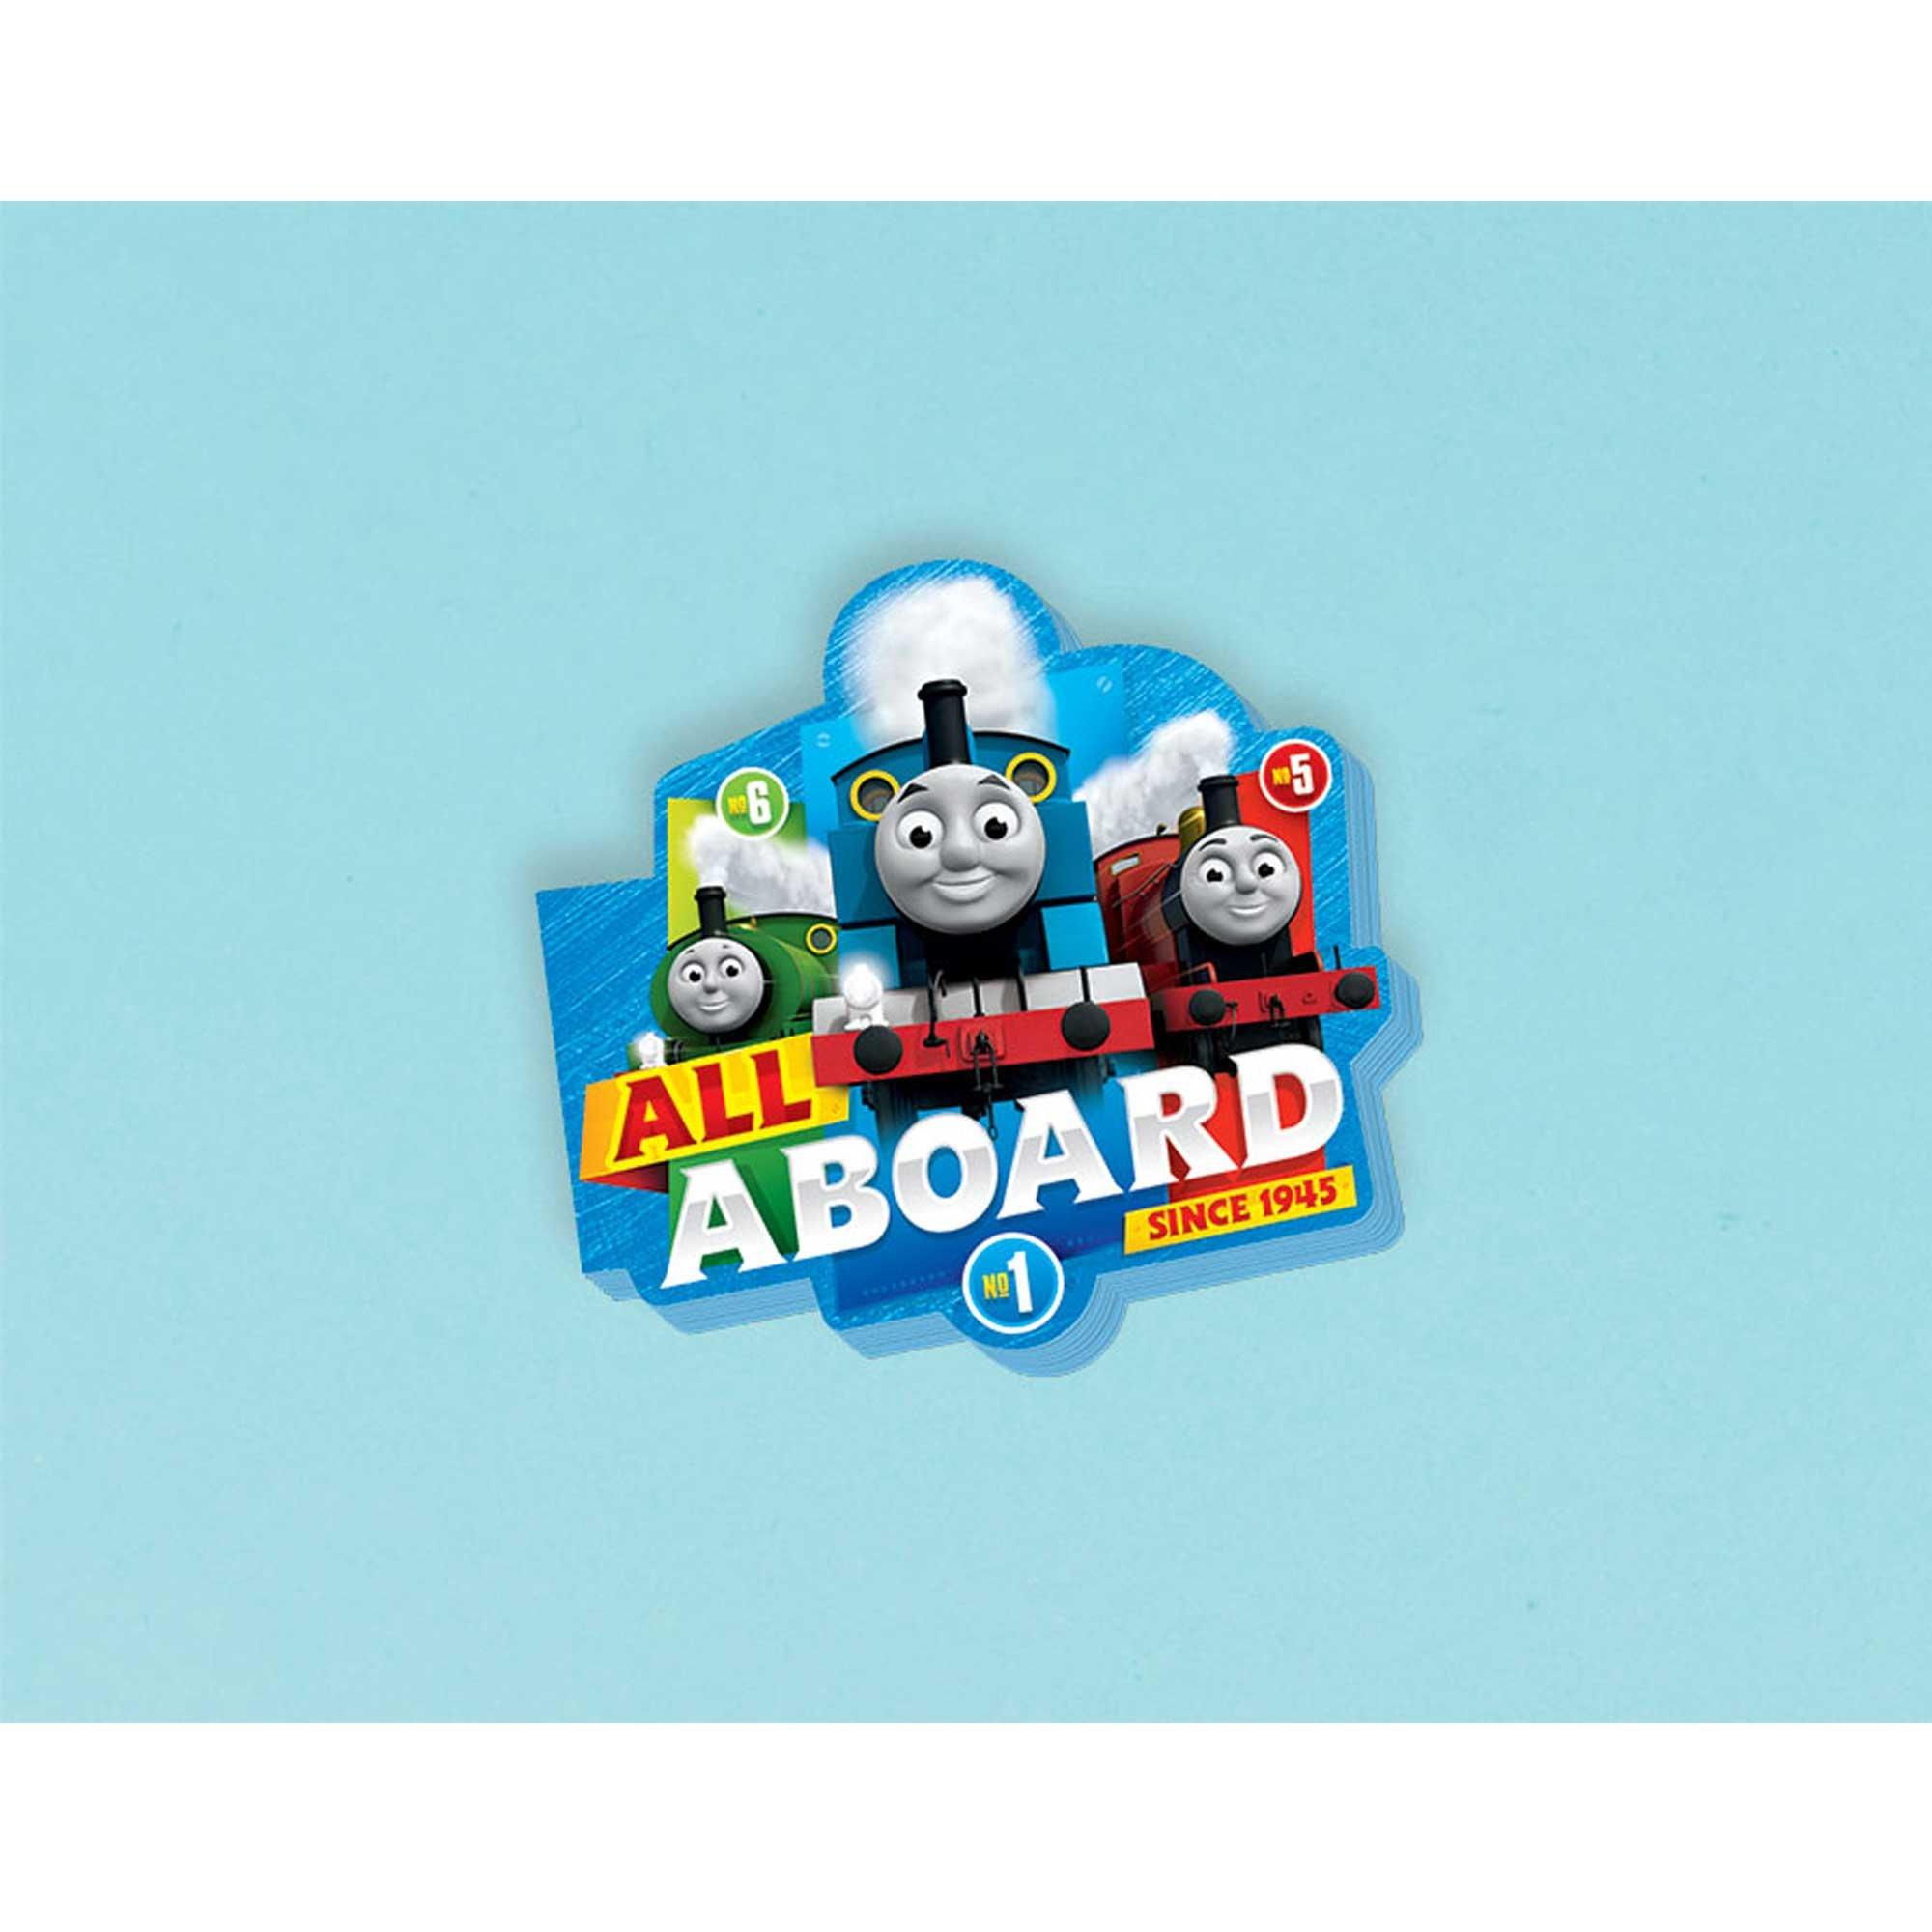 Thomas All Aboard Die Cut Mini Notepad Favor